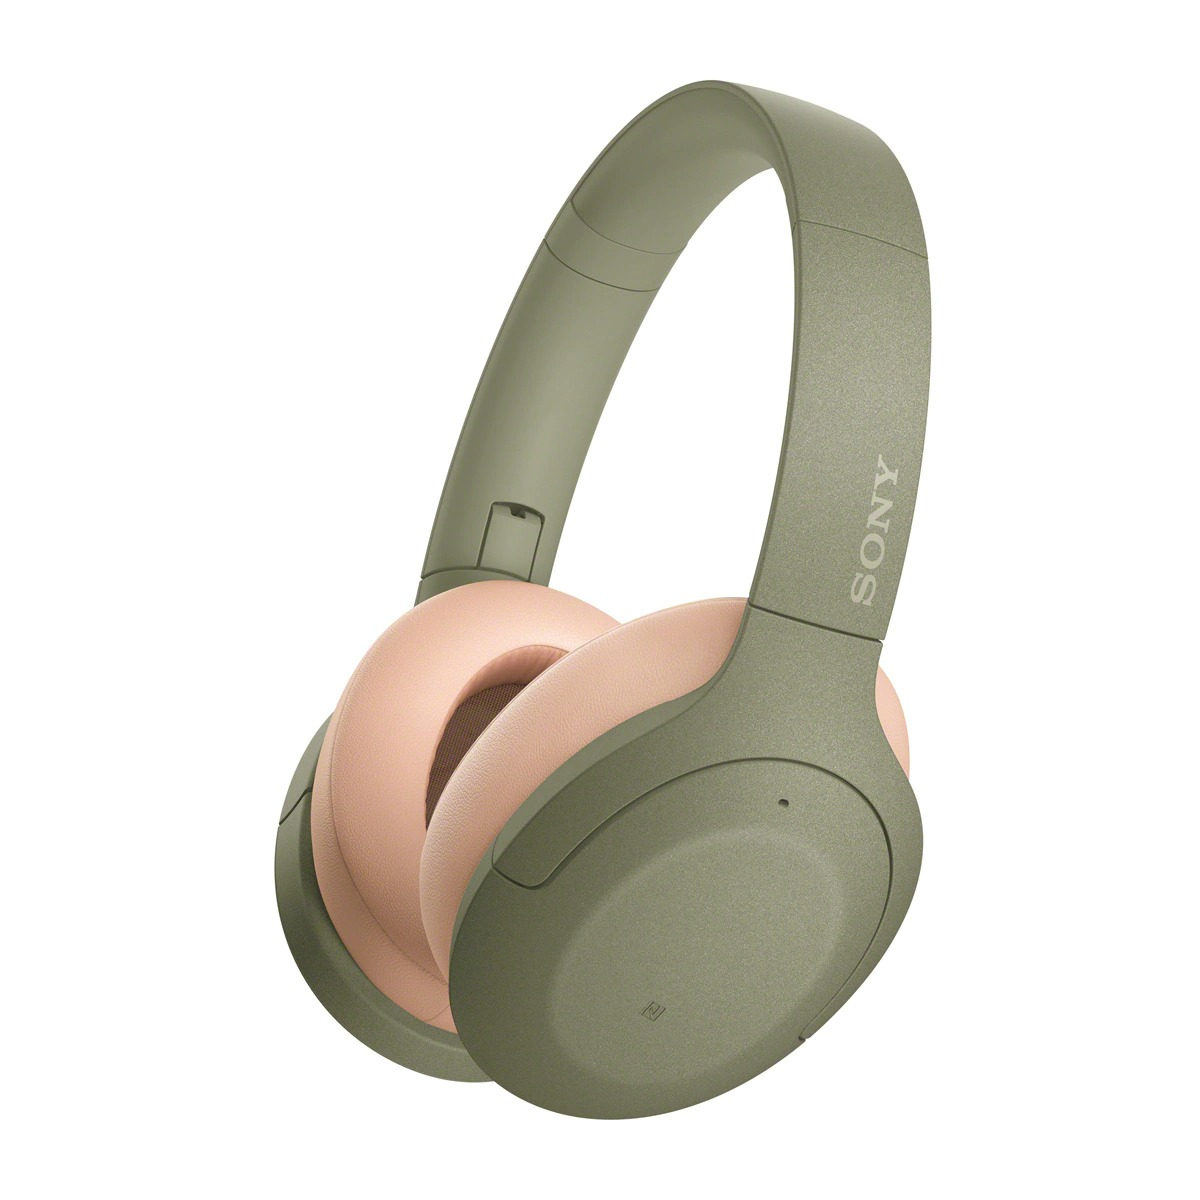 Auriculares de diadema Sony WH-H910N Verde, Hi-Res Audio, Noise Cancelling y NFC/Bluetooth con micrófono